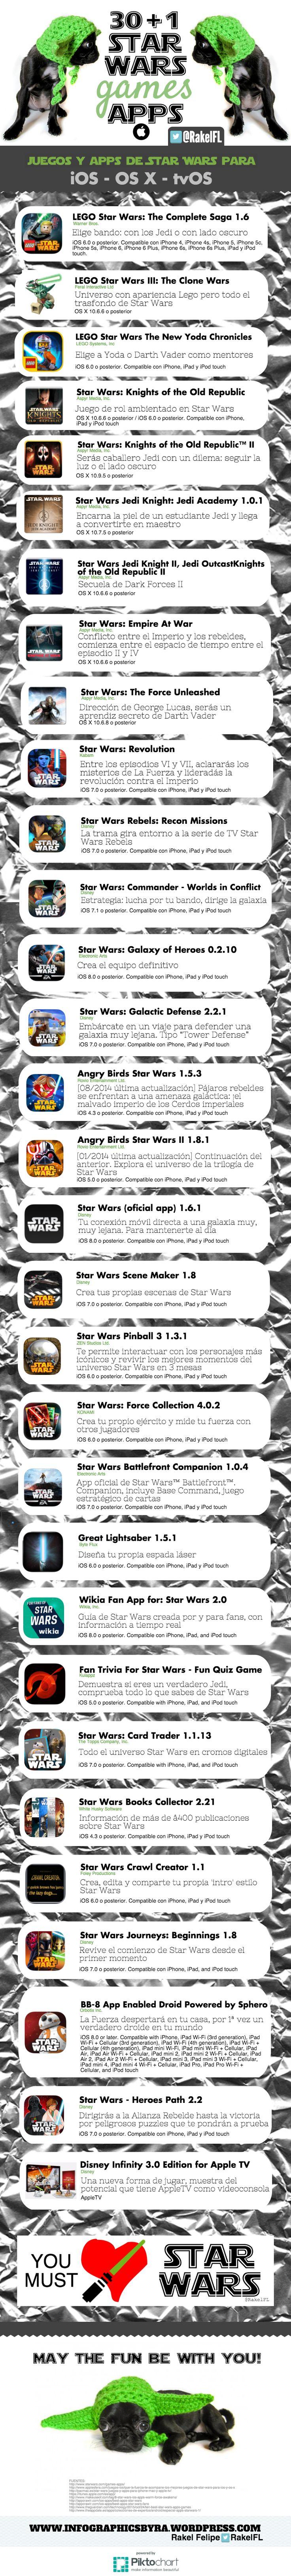 301 APPs de juegos de Star Wars #infografia #infographic #software